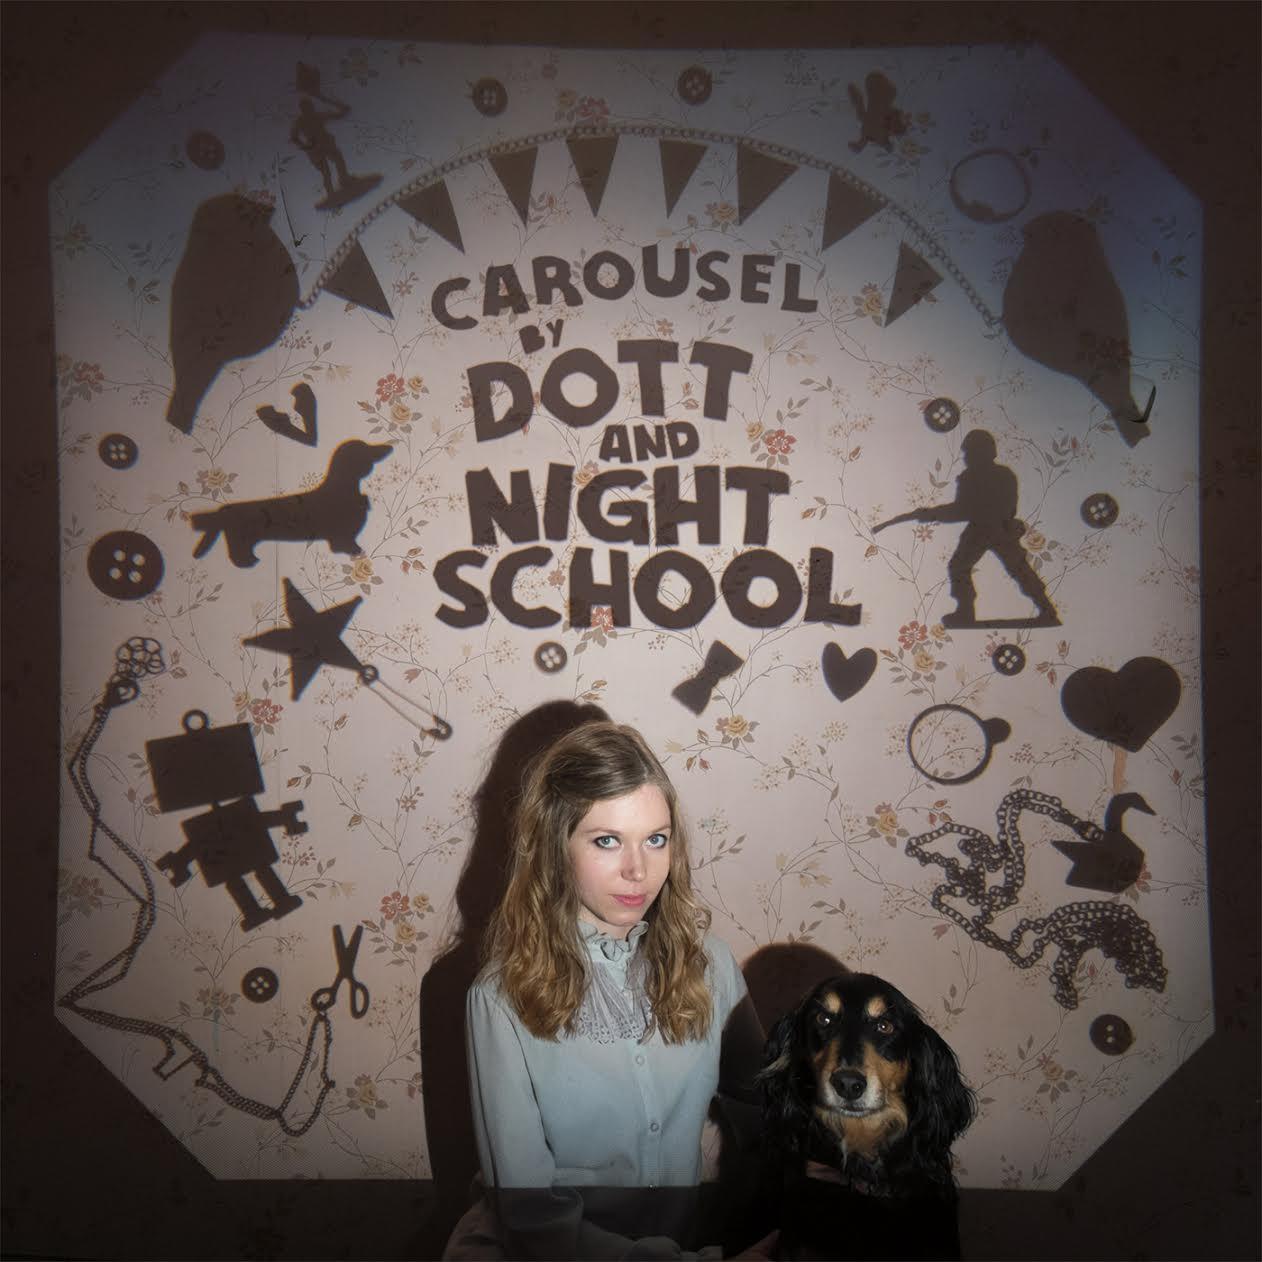 dottnightschool_carousel.jpg